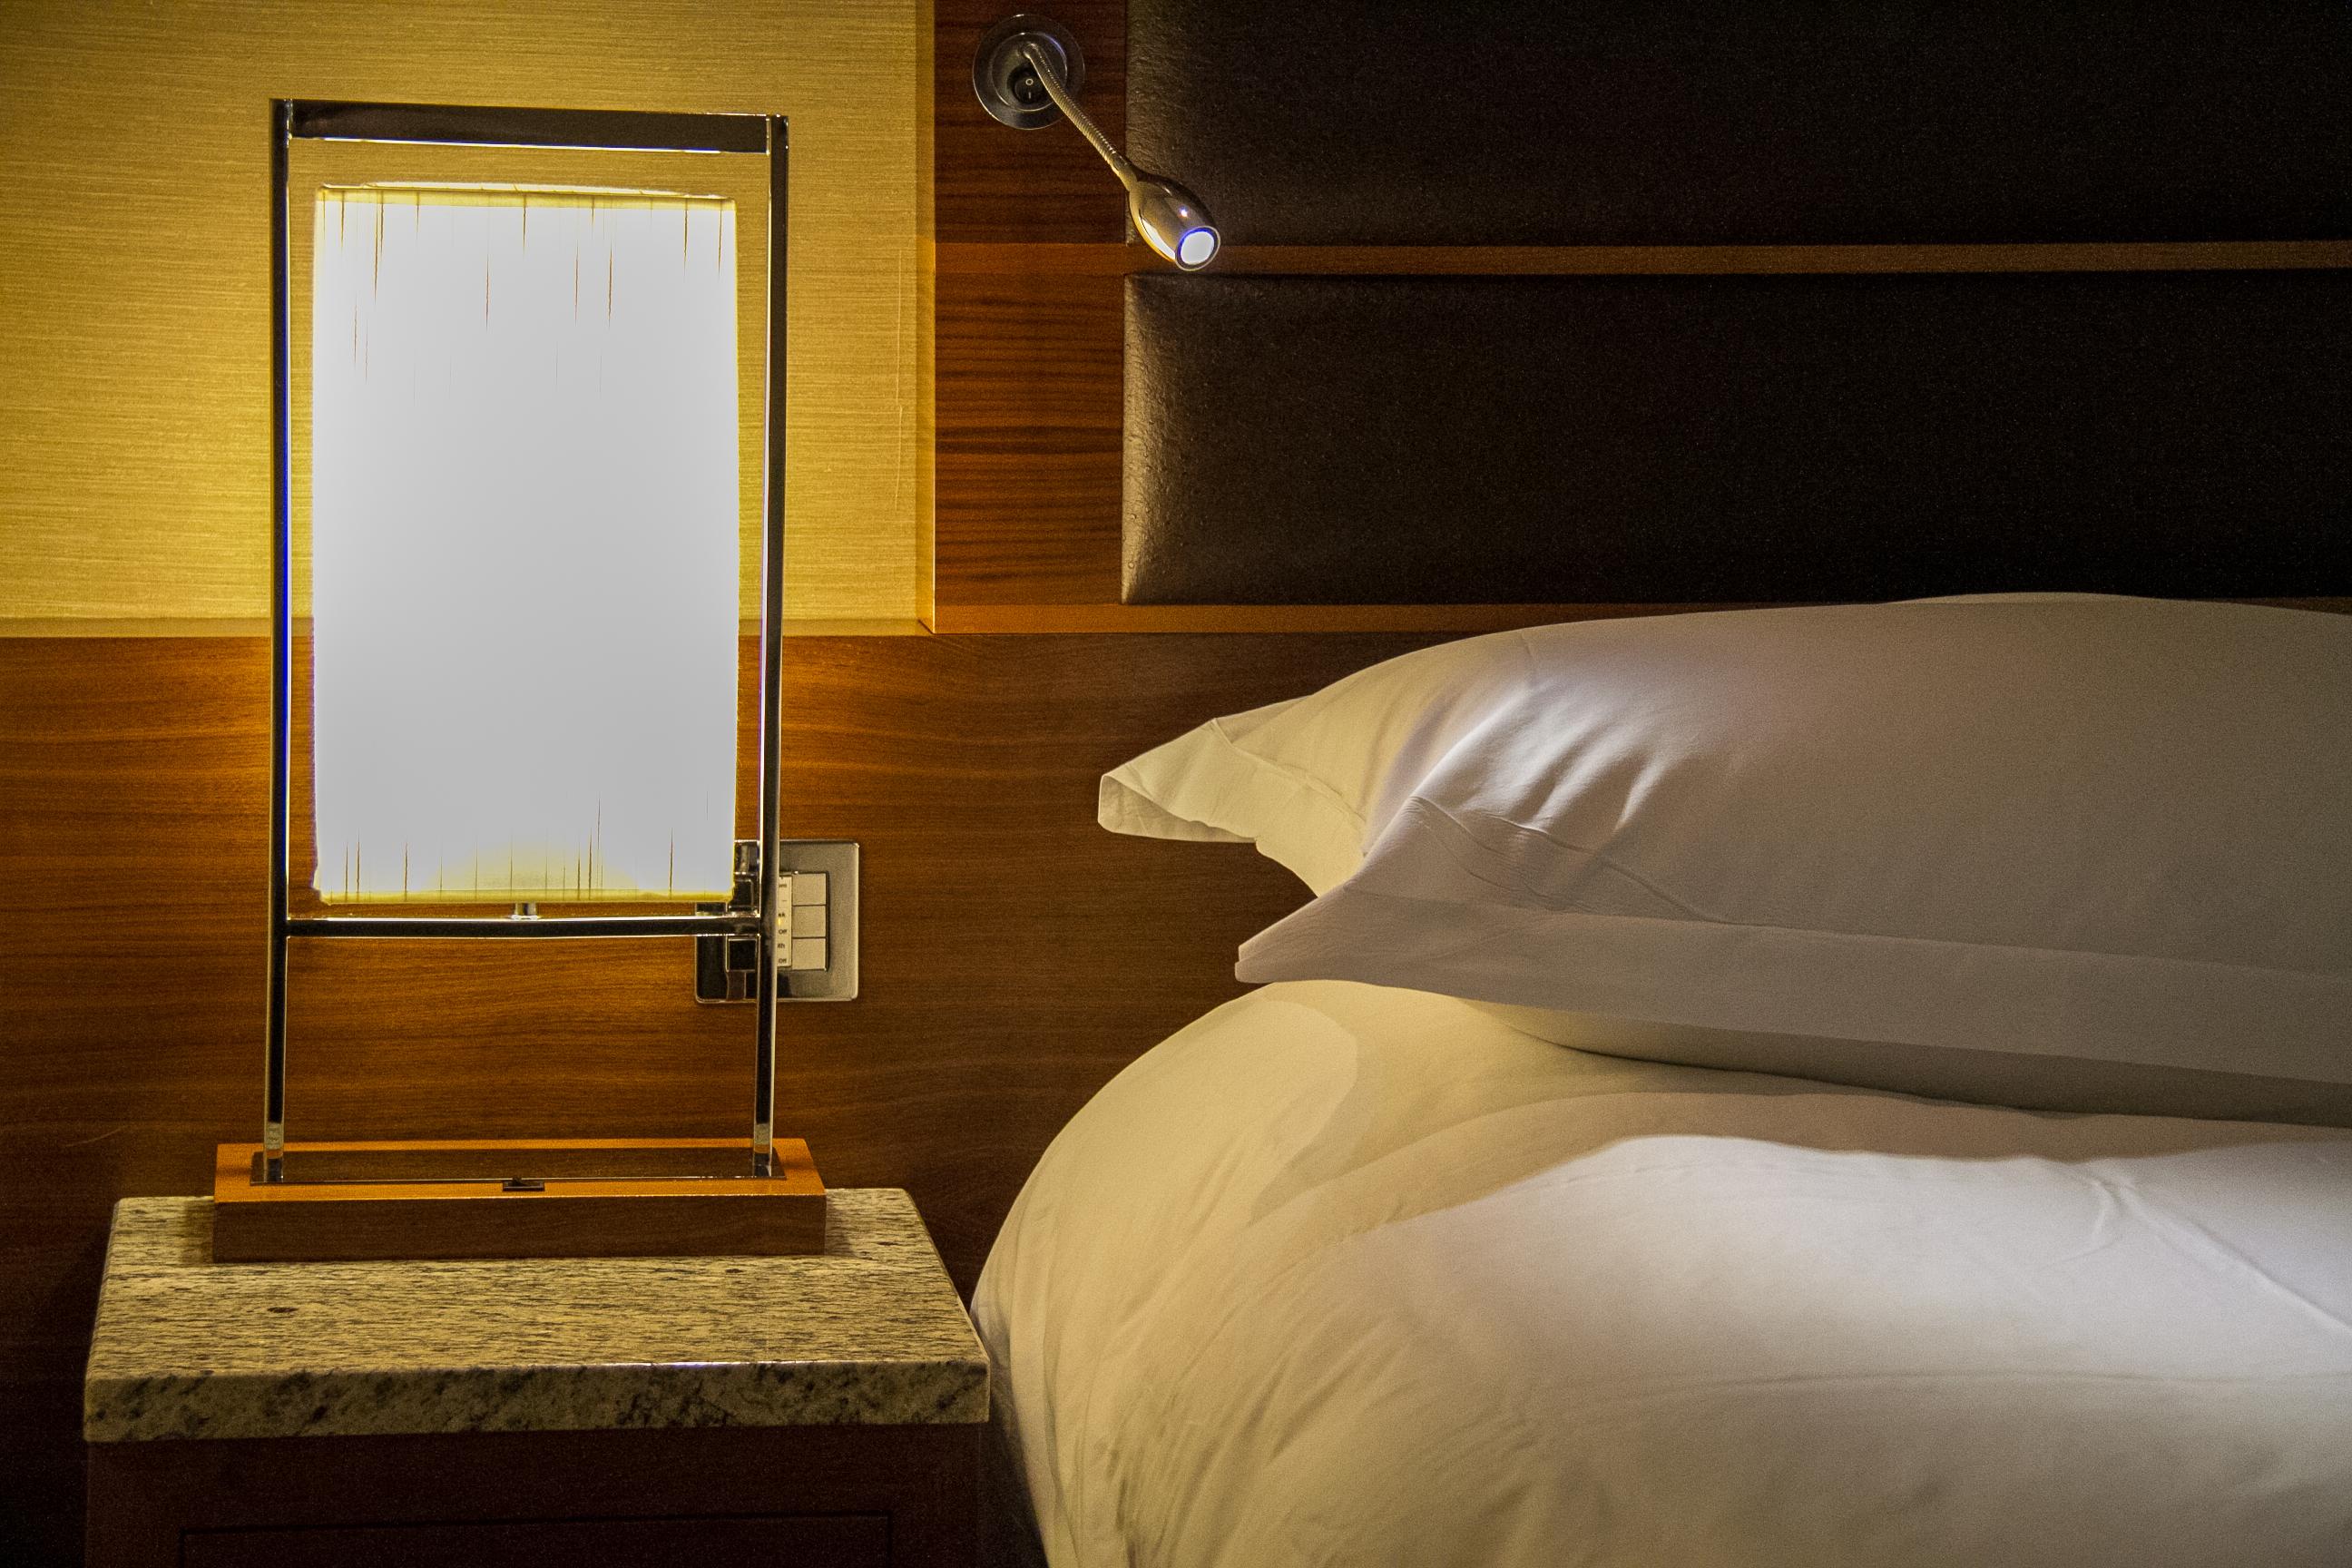 Bedside lamp in the Sofitel London Heathrow hotel